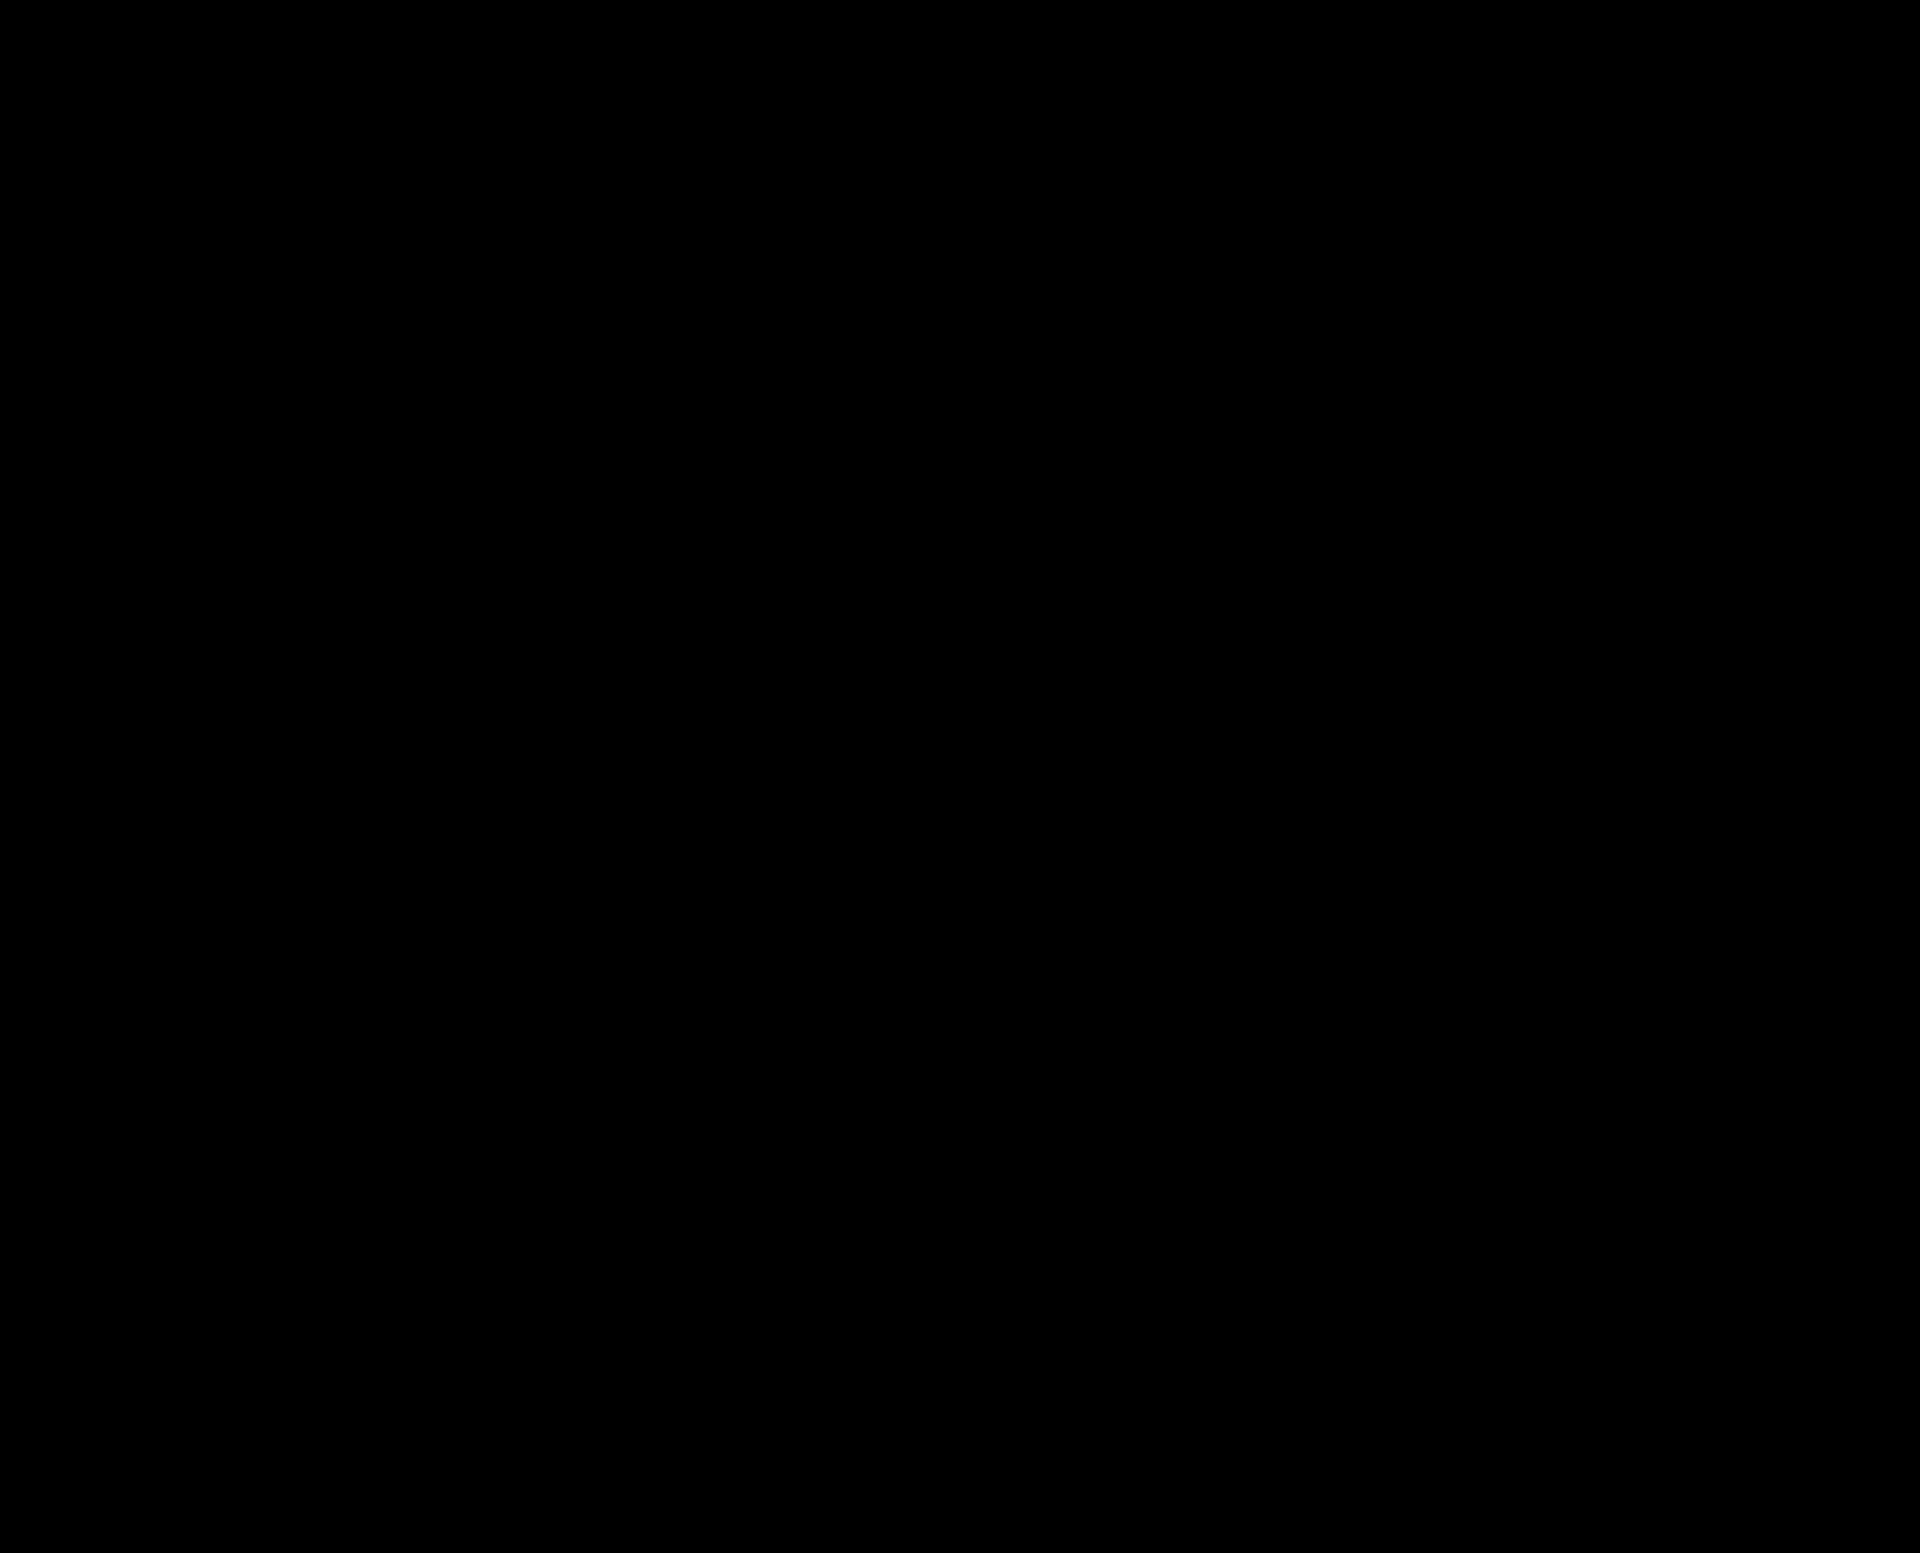 Dennis Rodman png